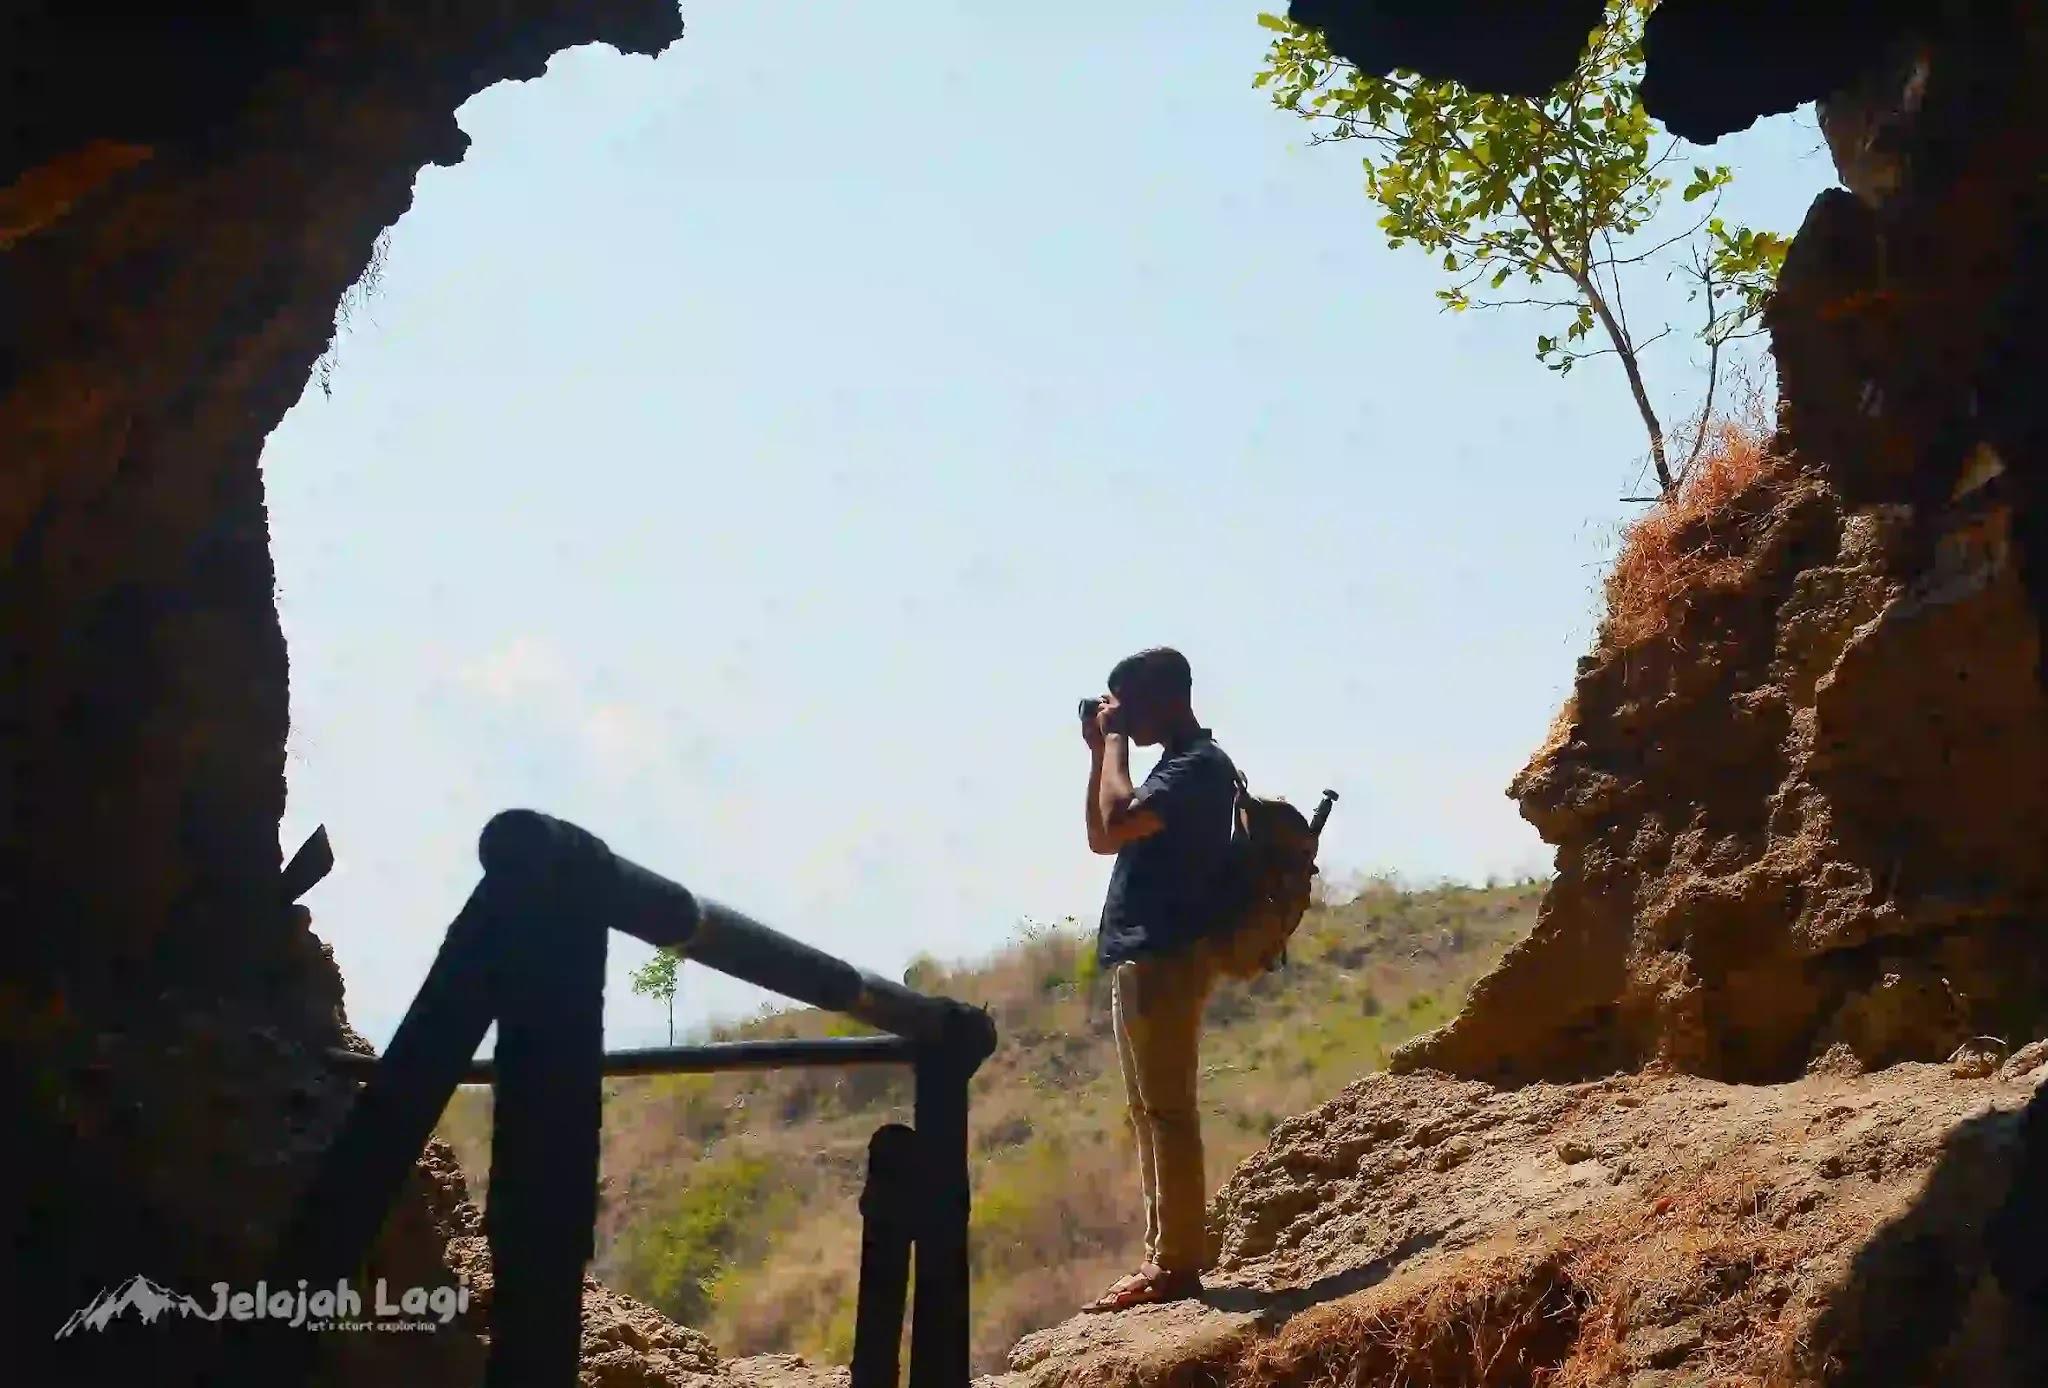 Pintu Goa Lawa Songgom Brebes - Foto Jelajah Lagi by JL Jaenal Jalalludin